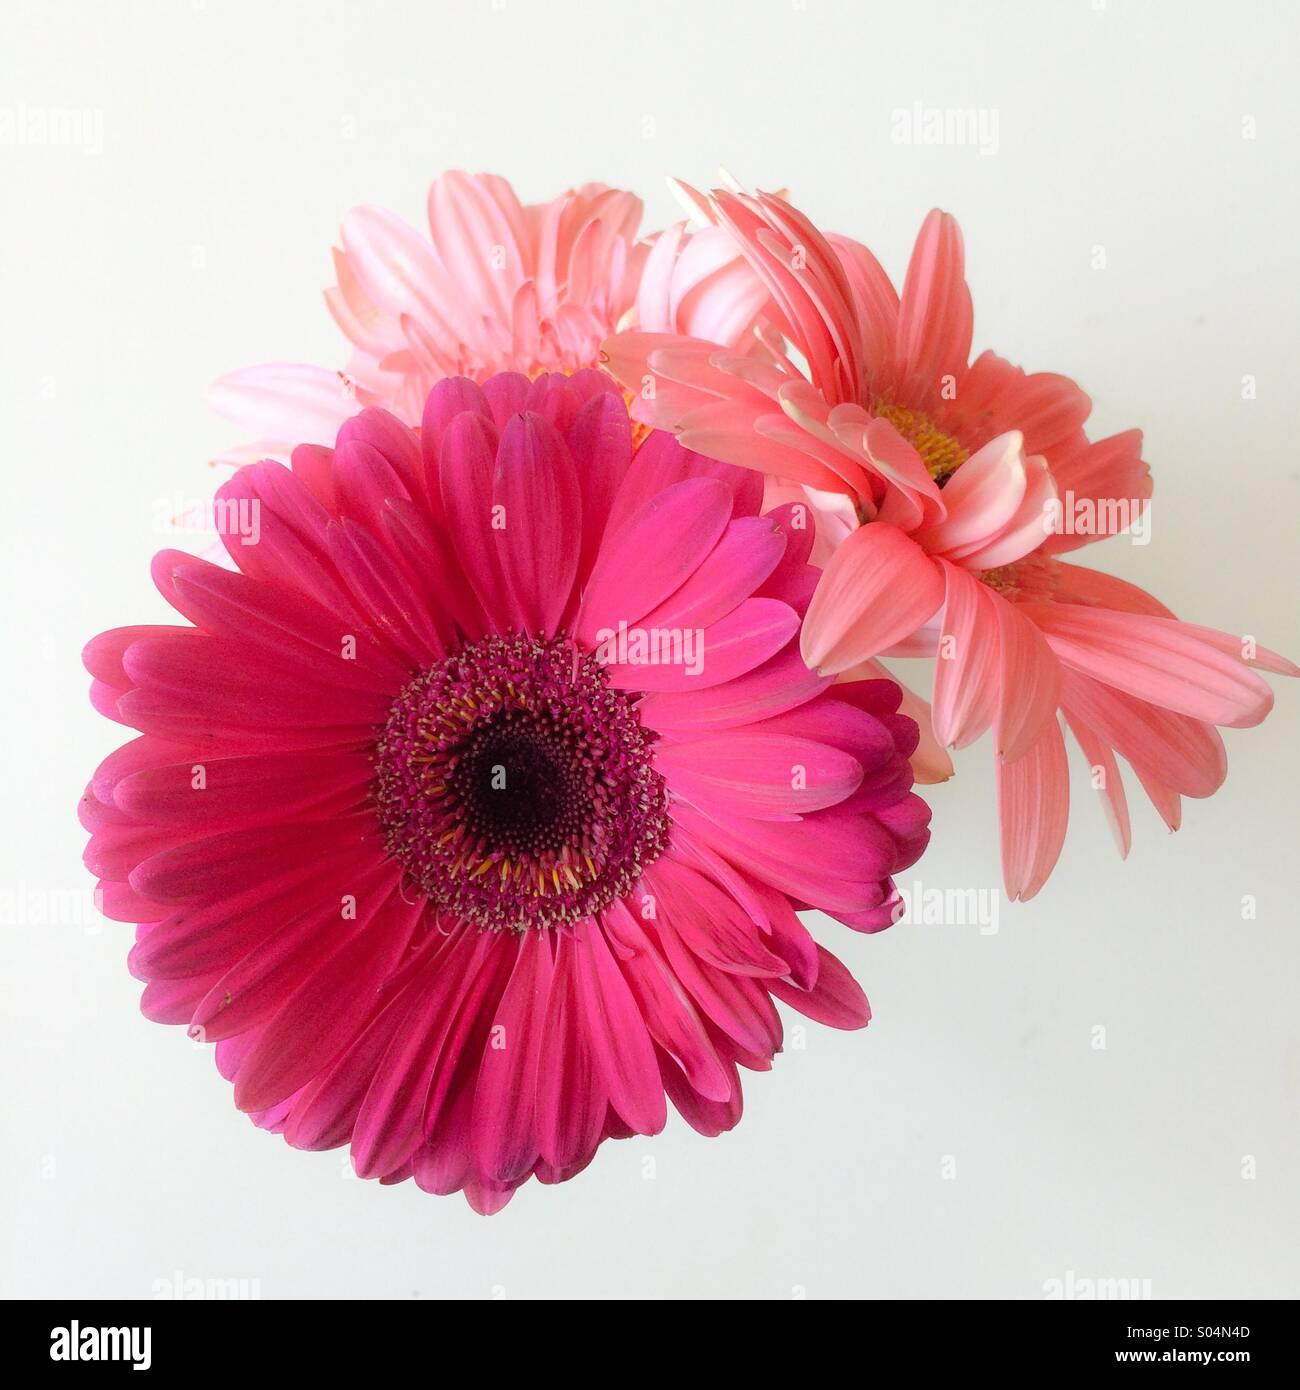 Drei Gerber Gänseblümchen Stockbild